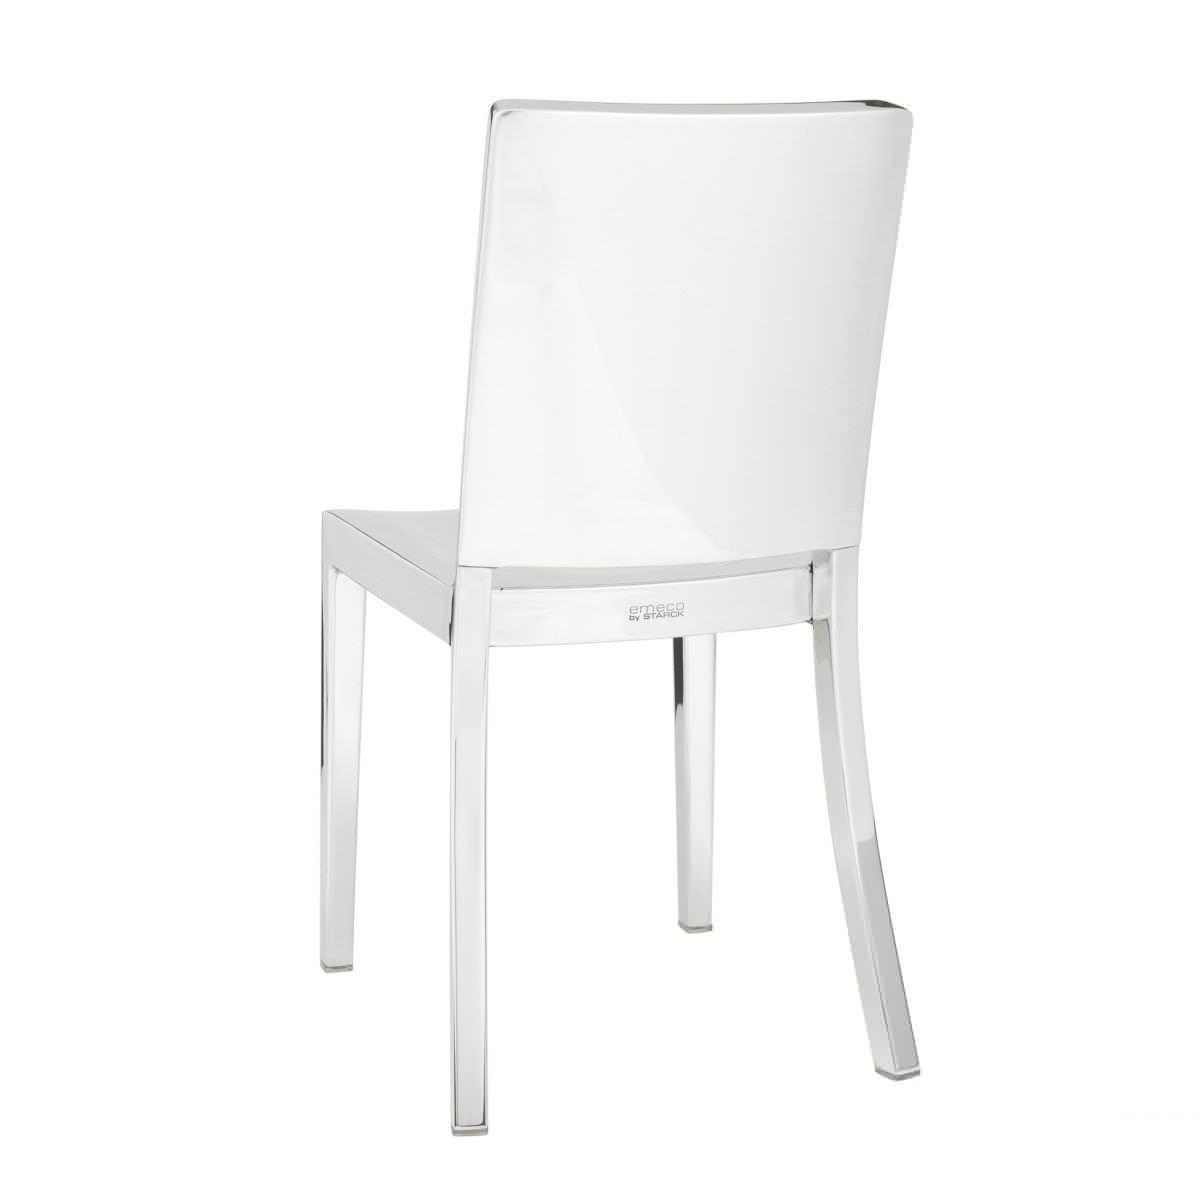 Moderner Stuhl / Aluminium / Von Philippe Starck ...